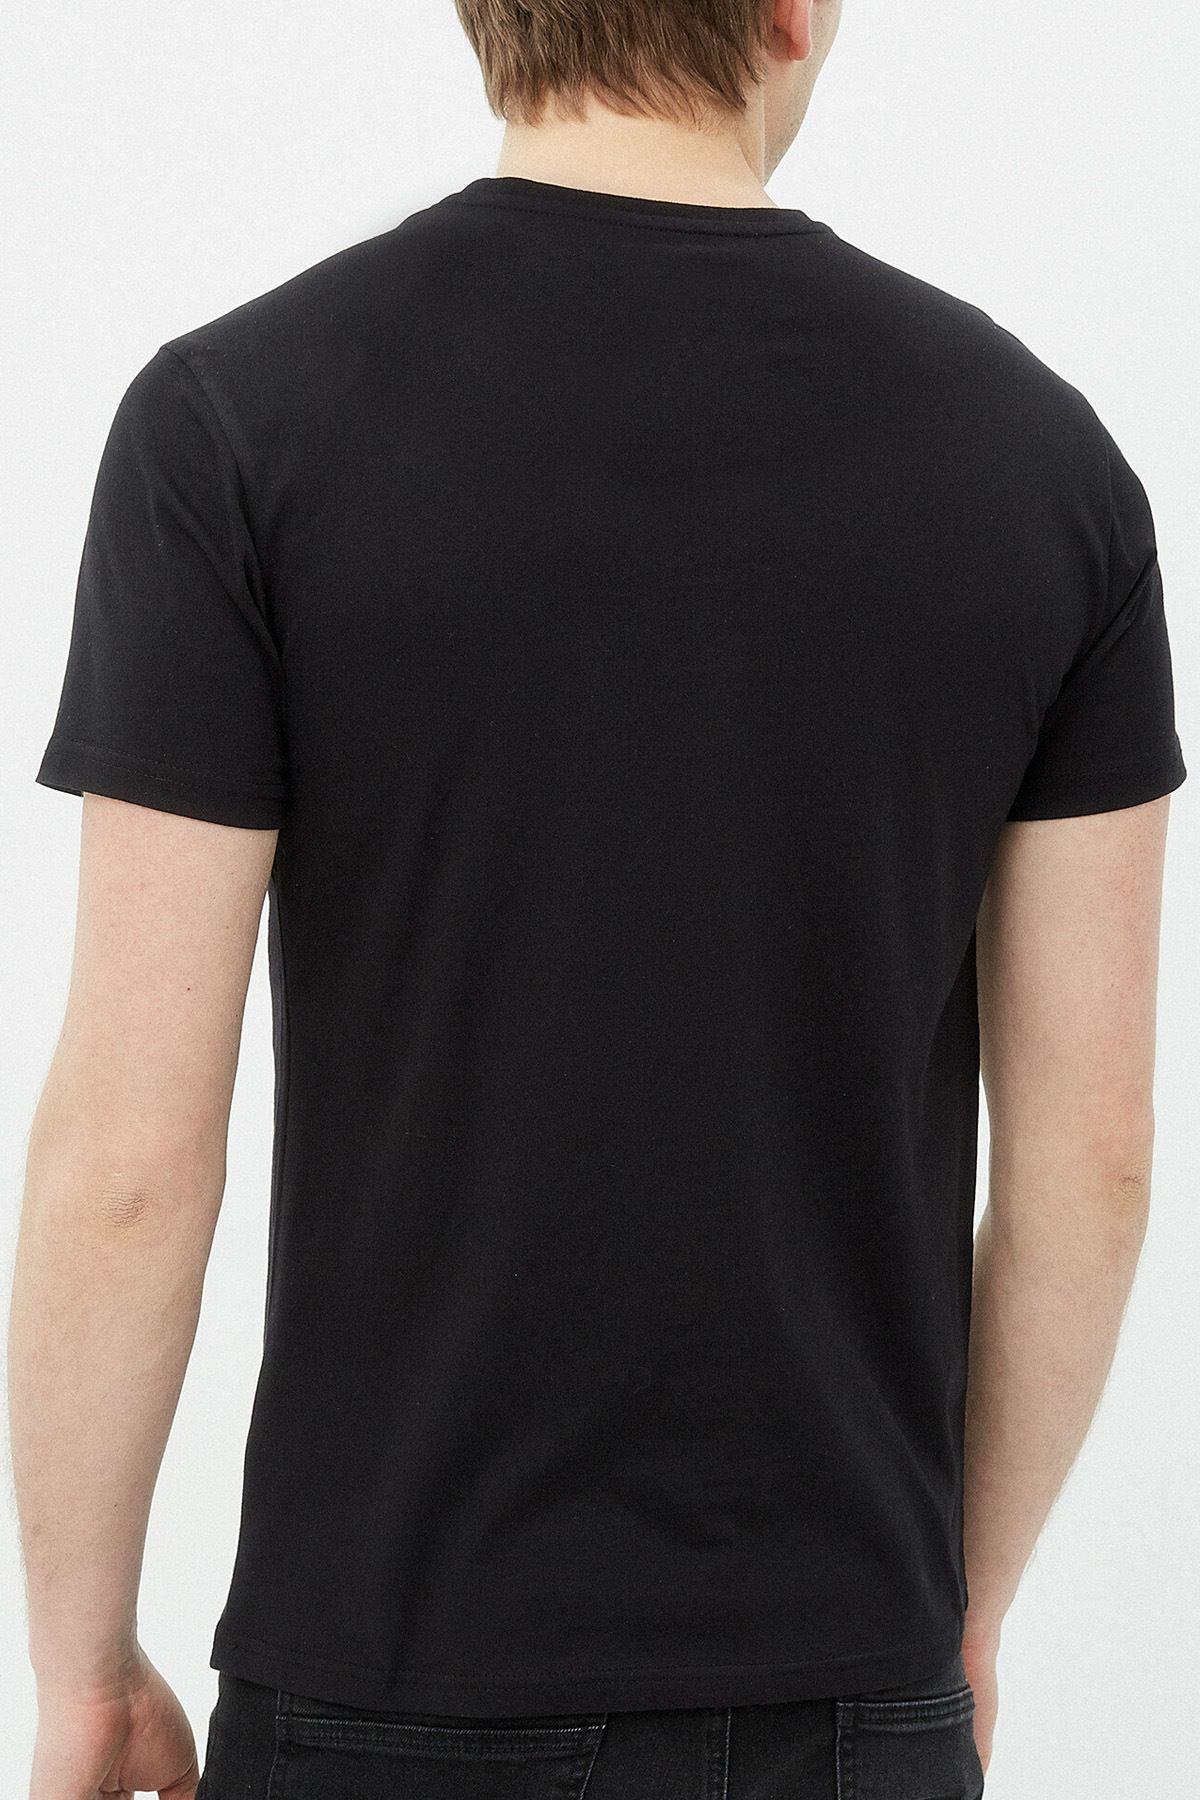 Naruto Anime 14 Siyah Erkek Tshirt - Tişört